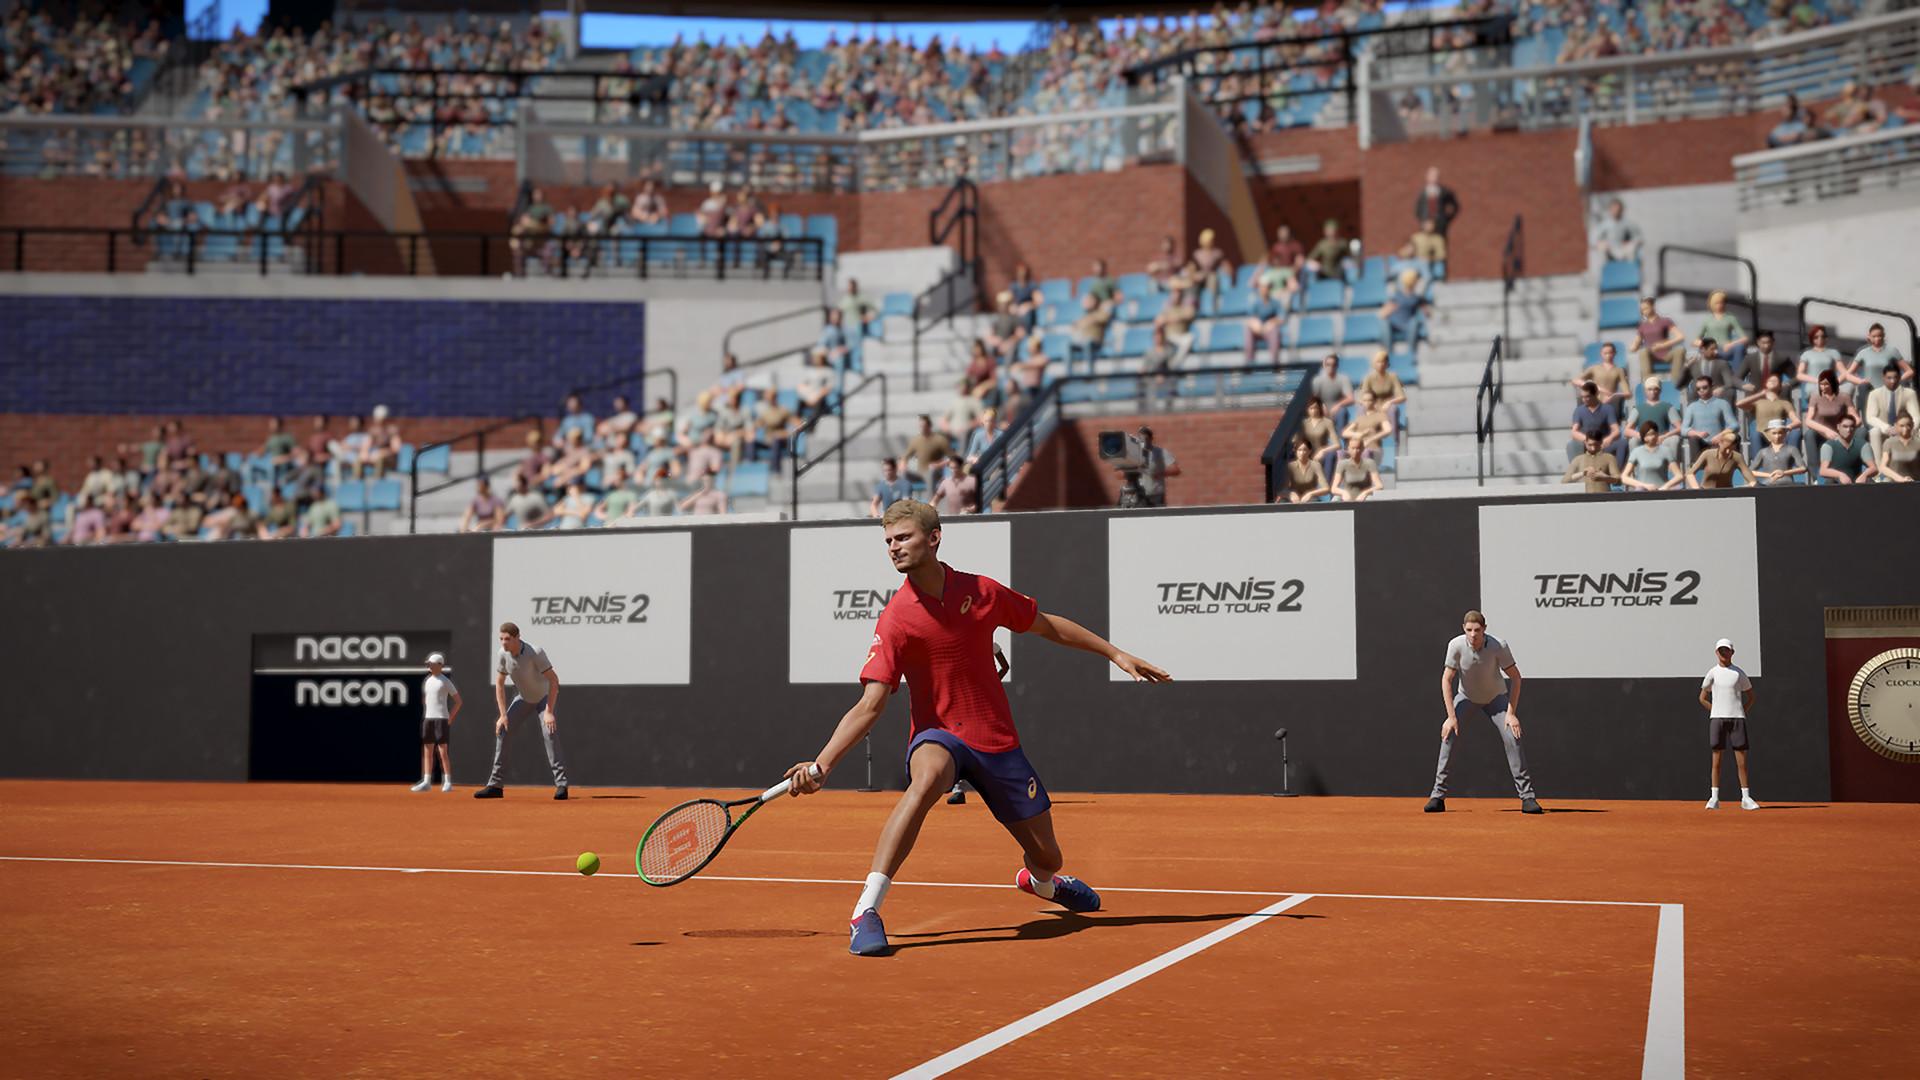 tennis-world-tour-2-pc-screenshot-02